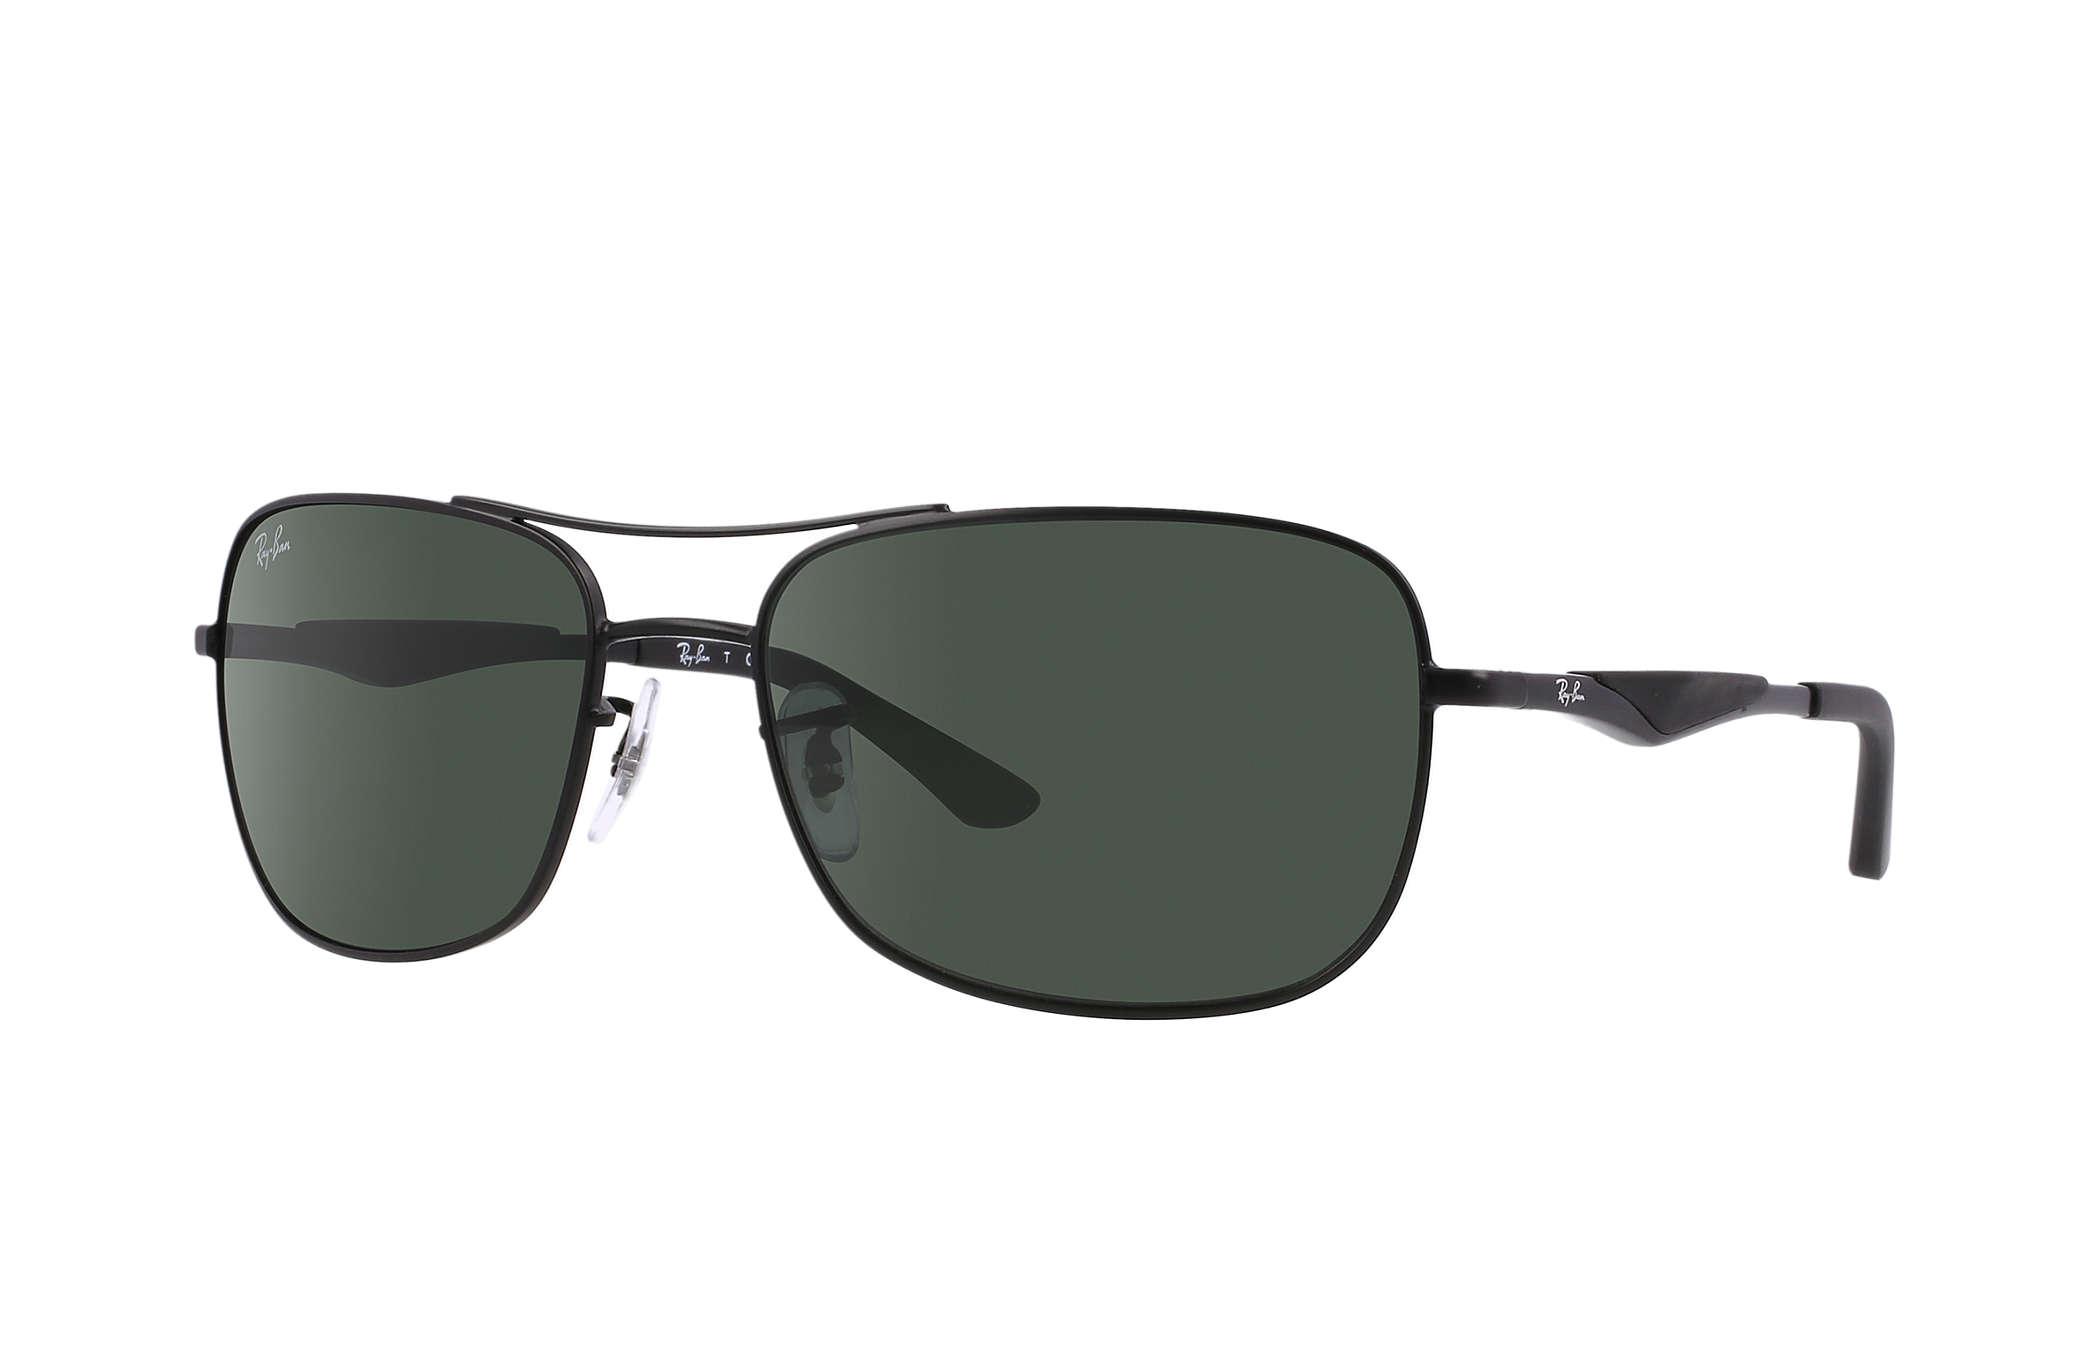 3fe08e2167b9 Ray-Ban RB3515 Black - Metal - Green Lenses - 0RB3515006 7161